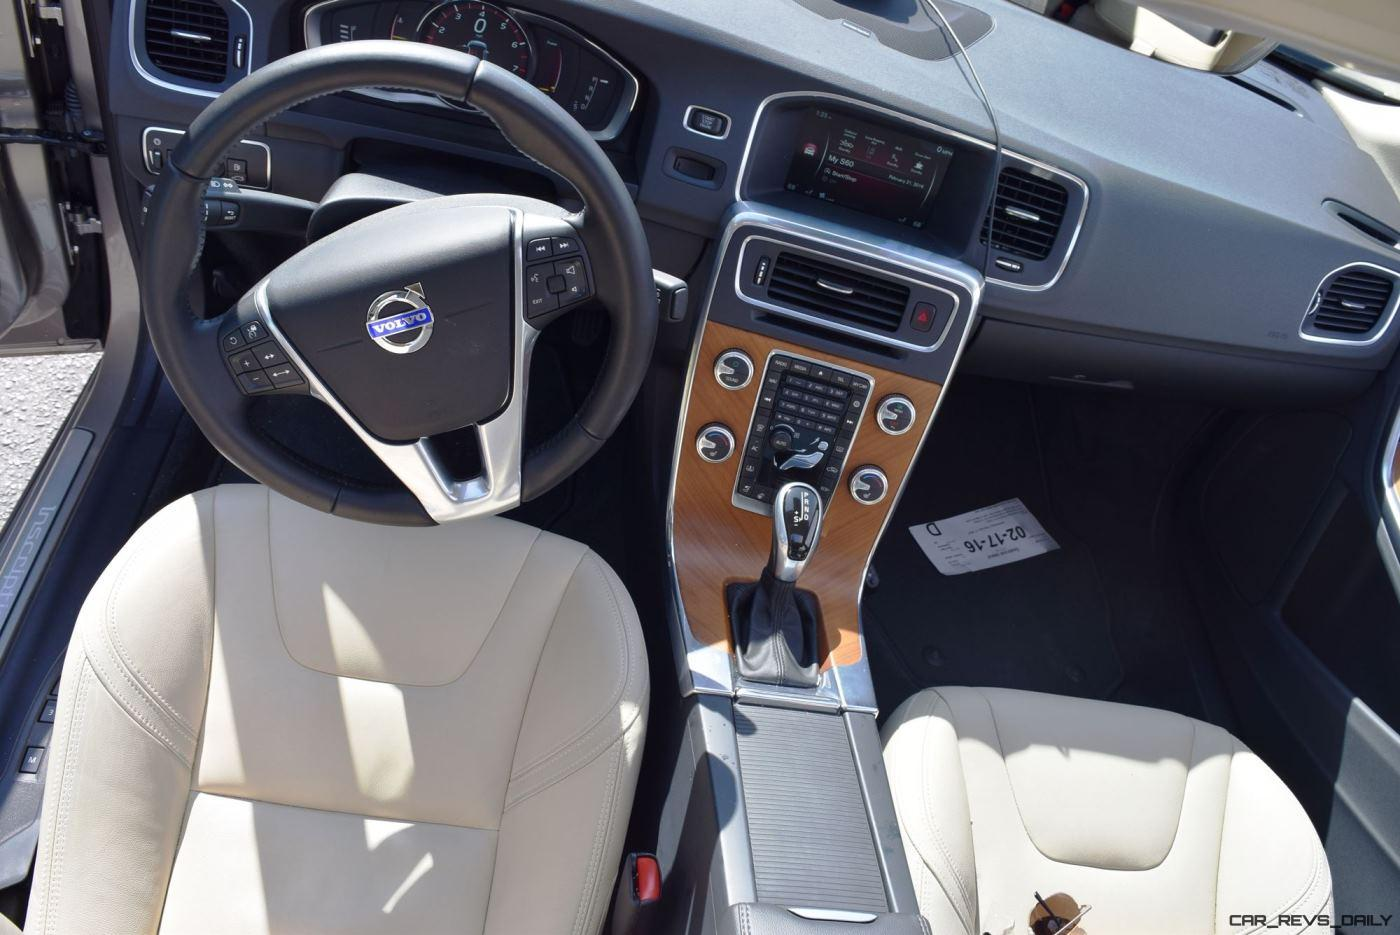 2017 Volvo S60 T5 Dynamic >> 2016 Volvo S60 Inscription - INTERIOR PHOTOS 9